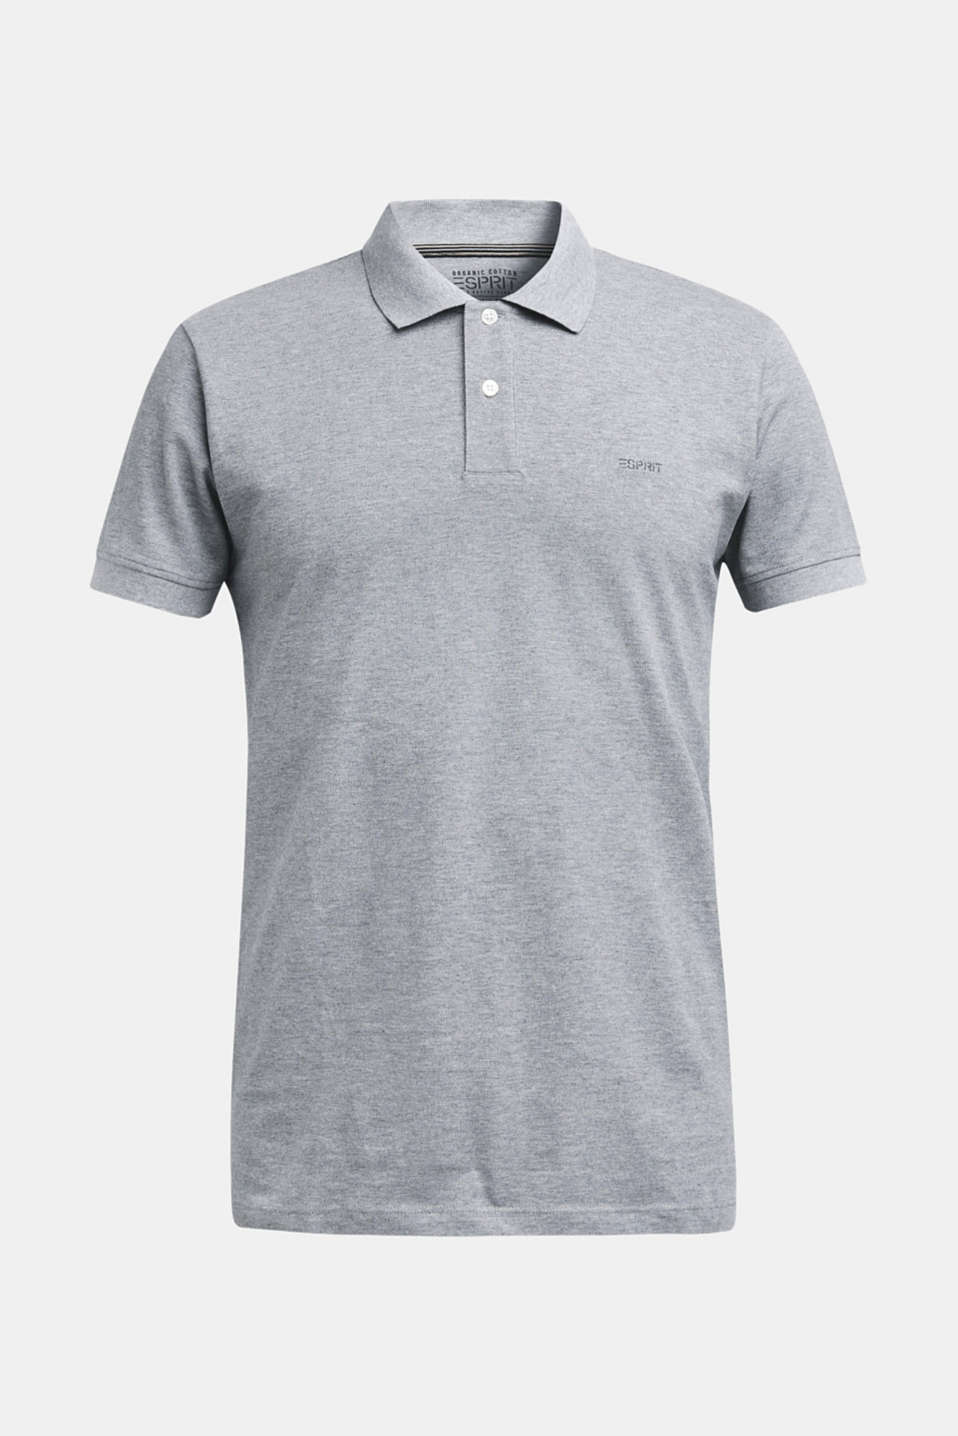 Piqué polo shirt in 100% cotton, MEDIUM GREY, detail image number 6